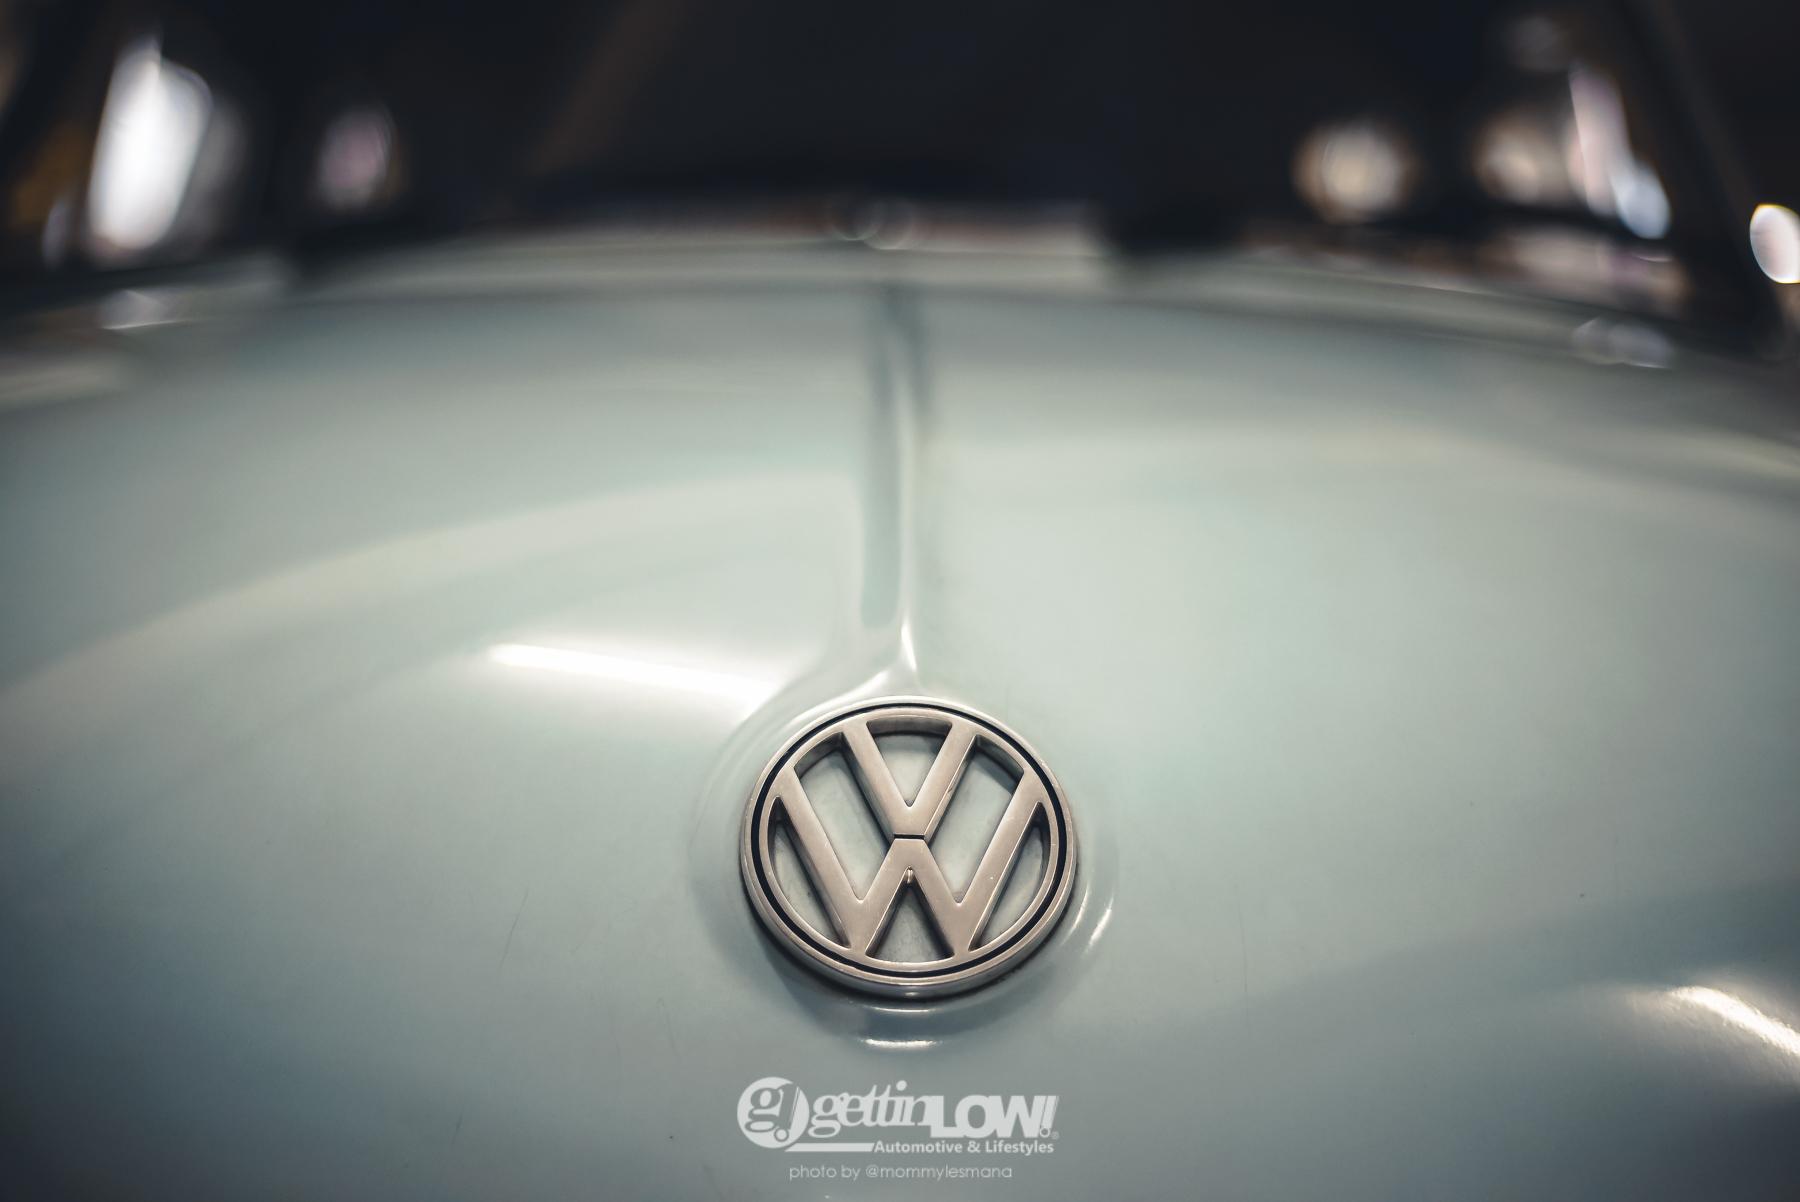 1968 VW Type 3 Variant (Squareback LHD)